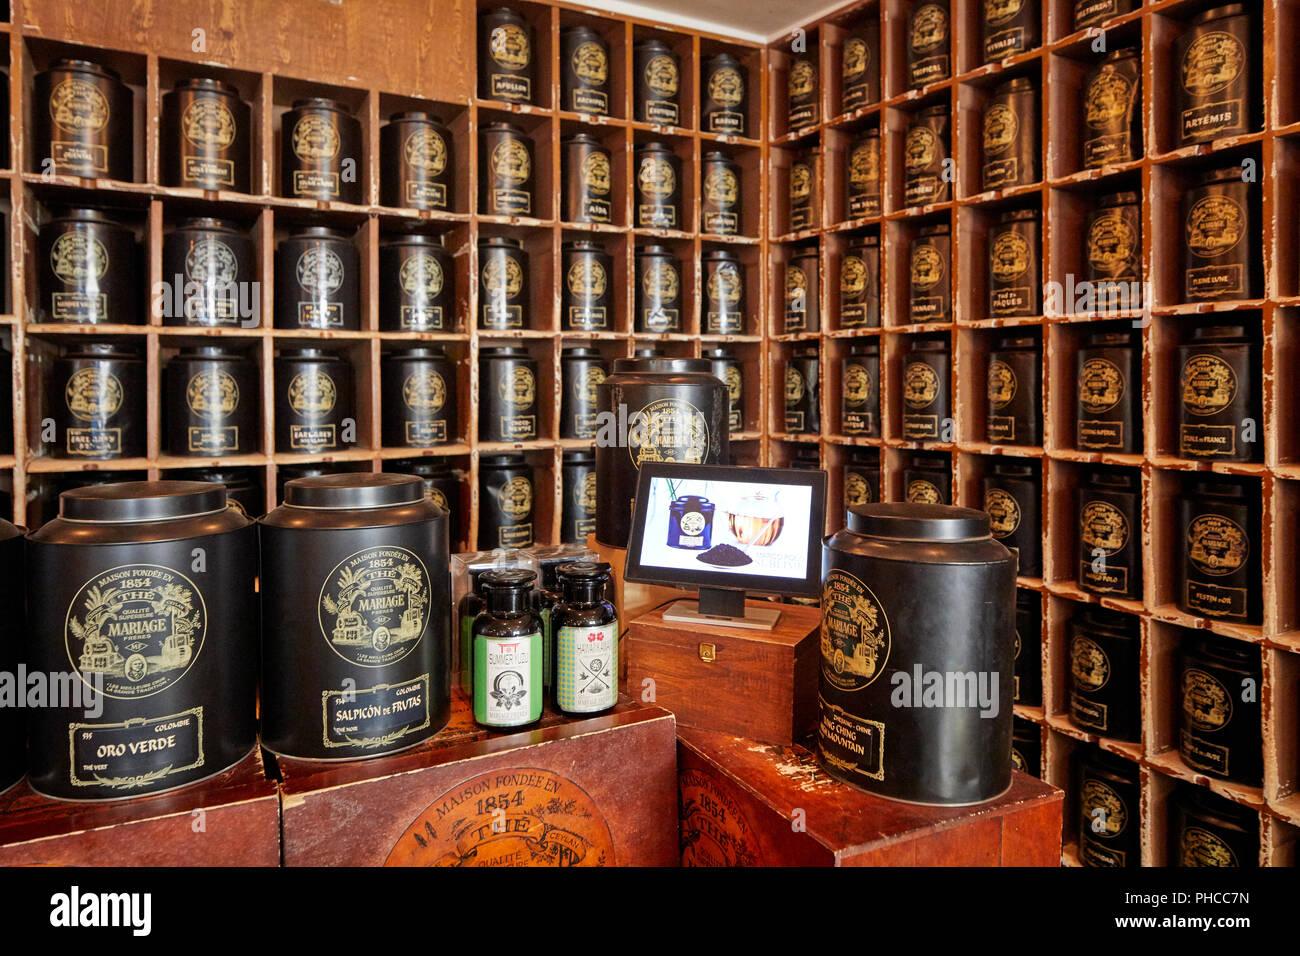 Mariage Freres tea shop on Rue du Bourg Tibourg in Le Marais in Paris - Stock Image